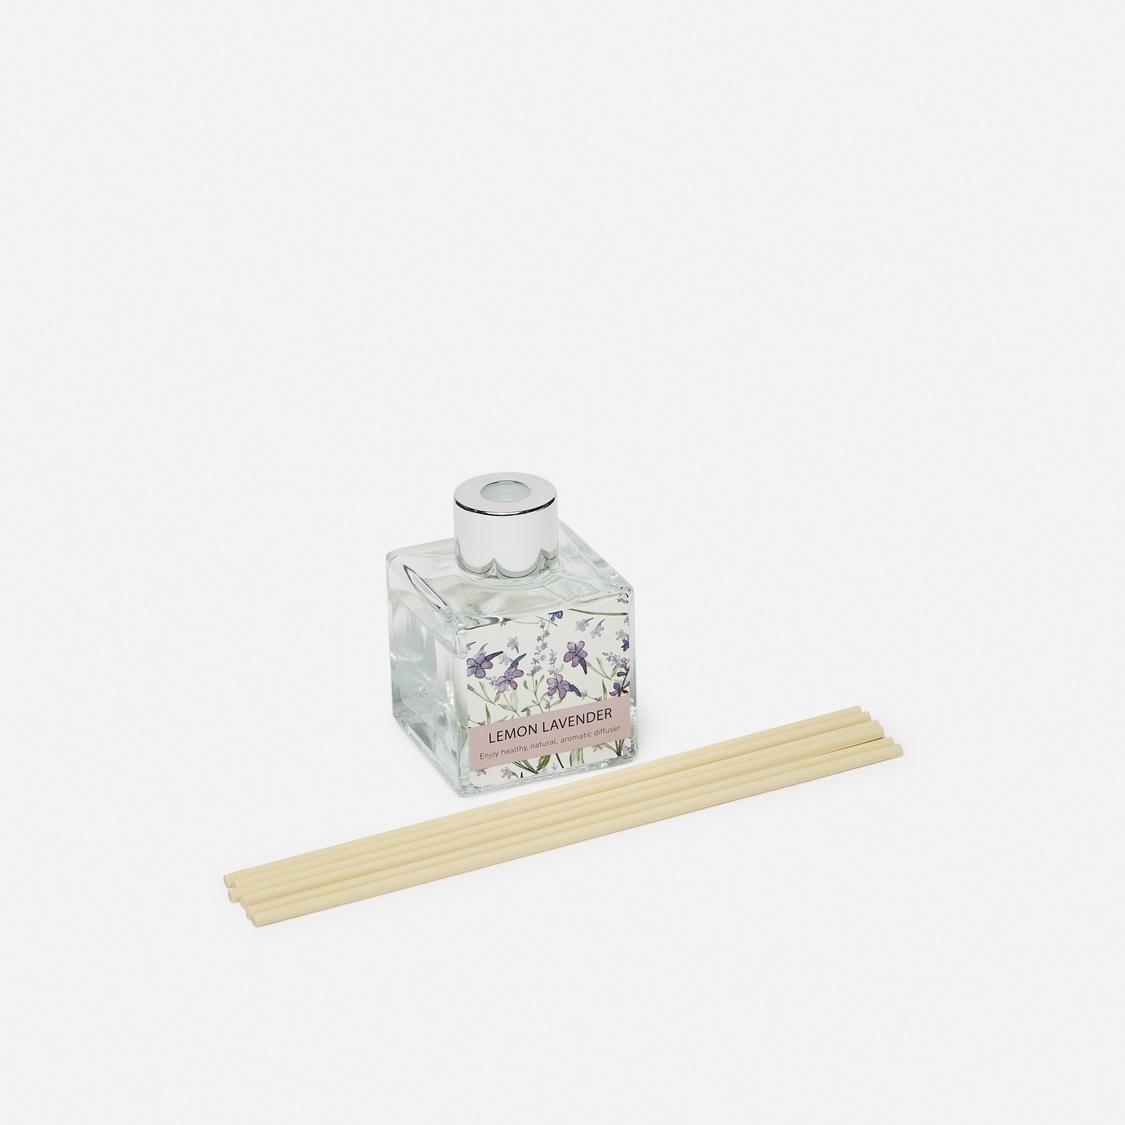 Lemon Lavender Reed Diffuser - 50 ml